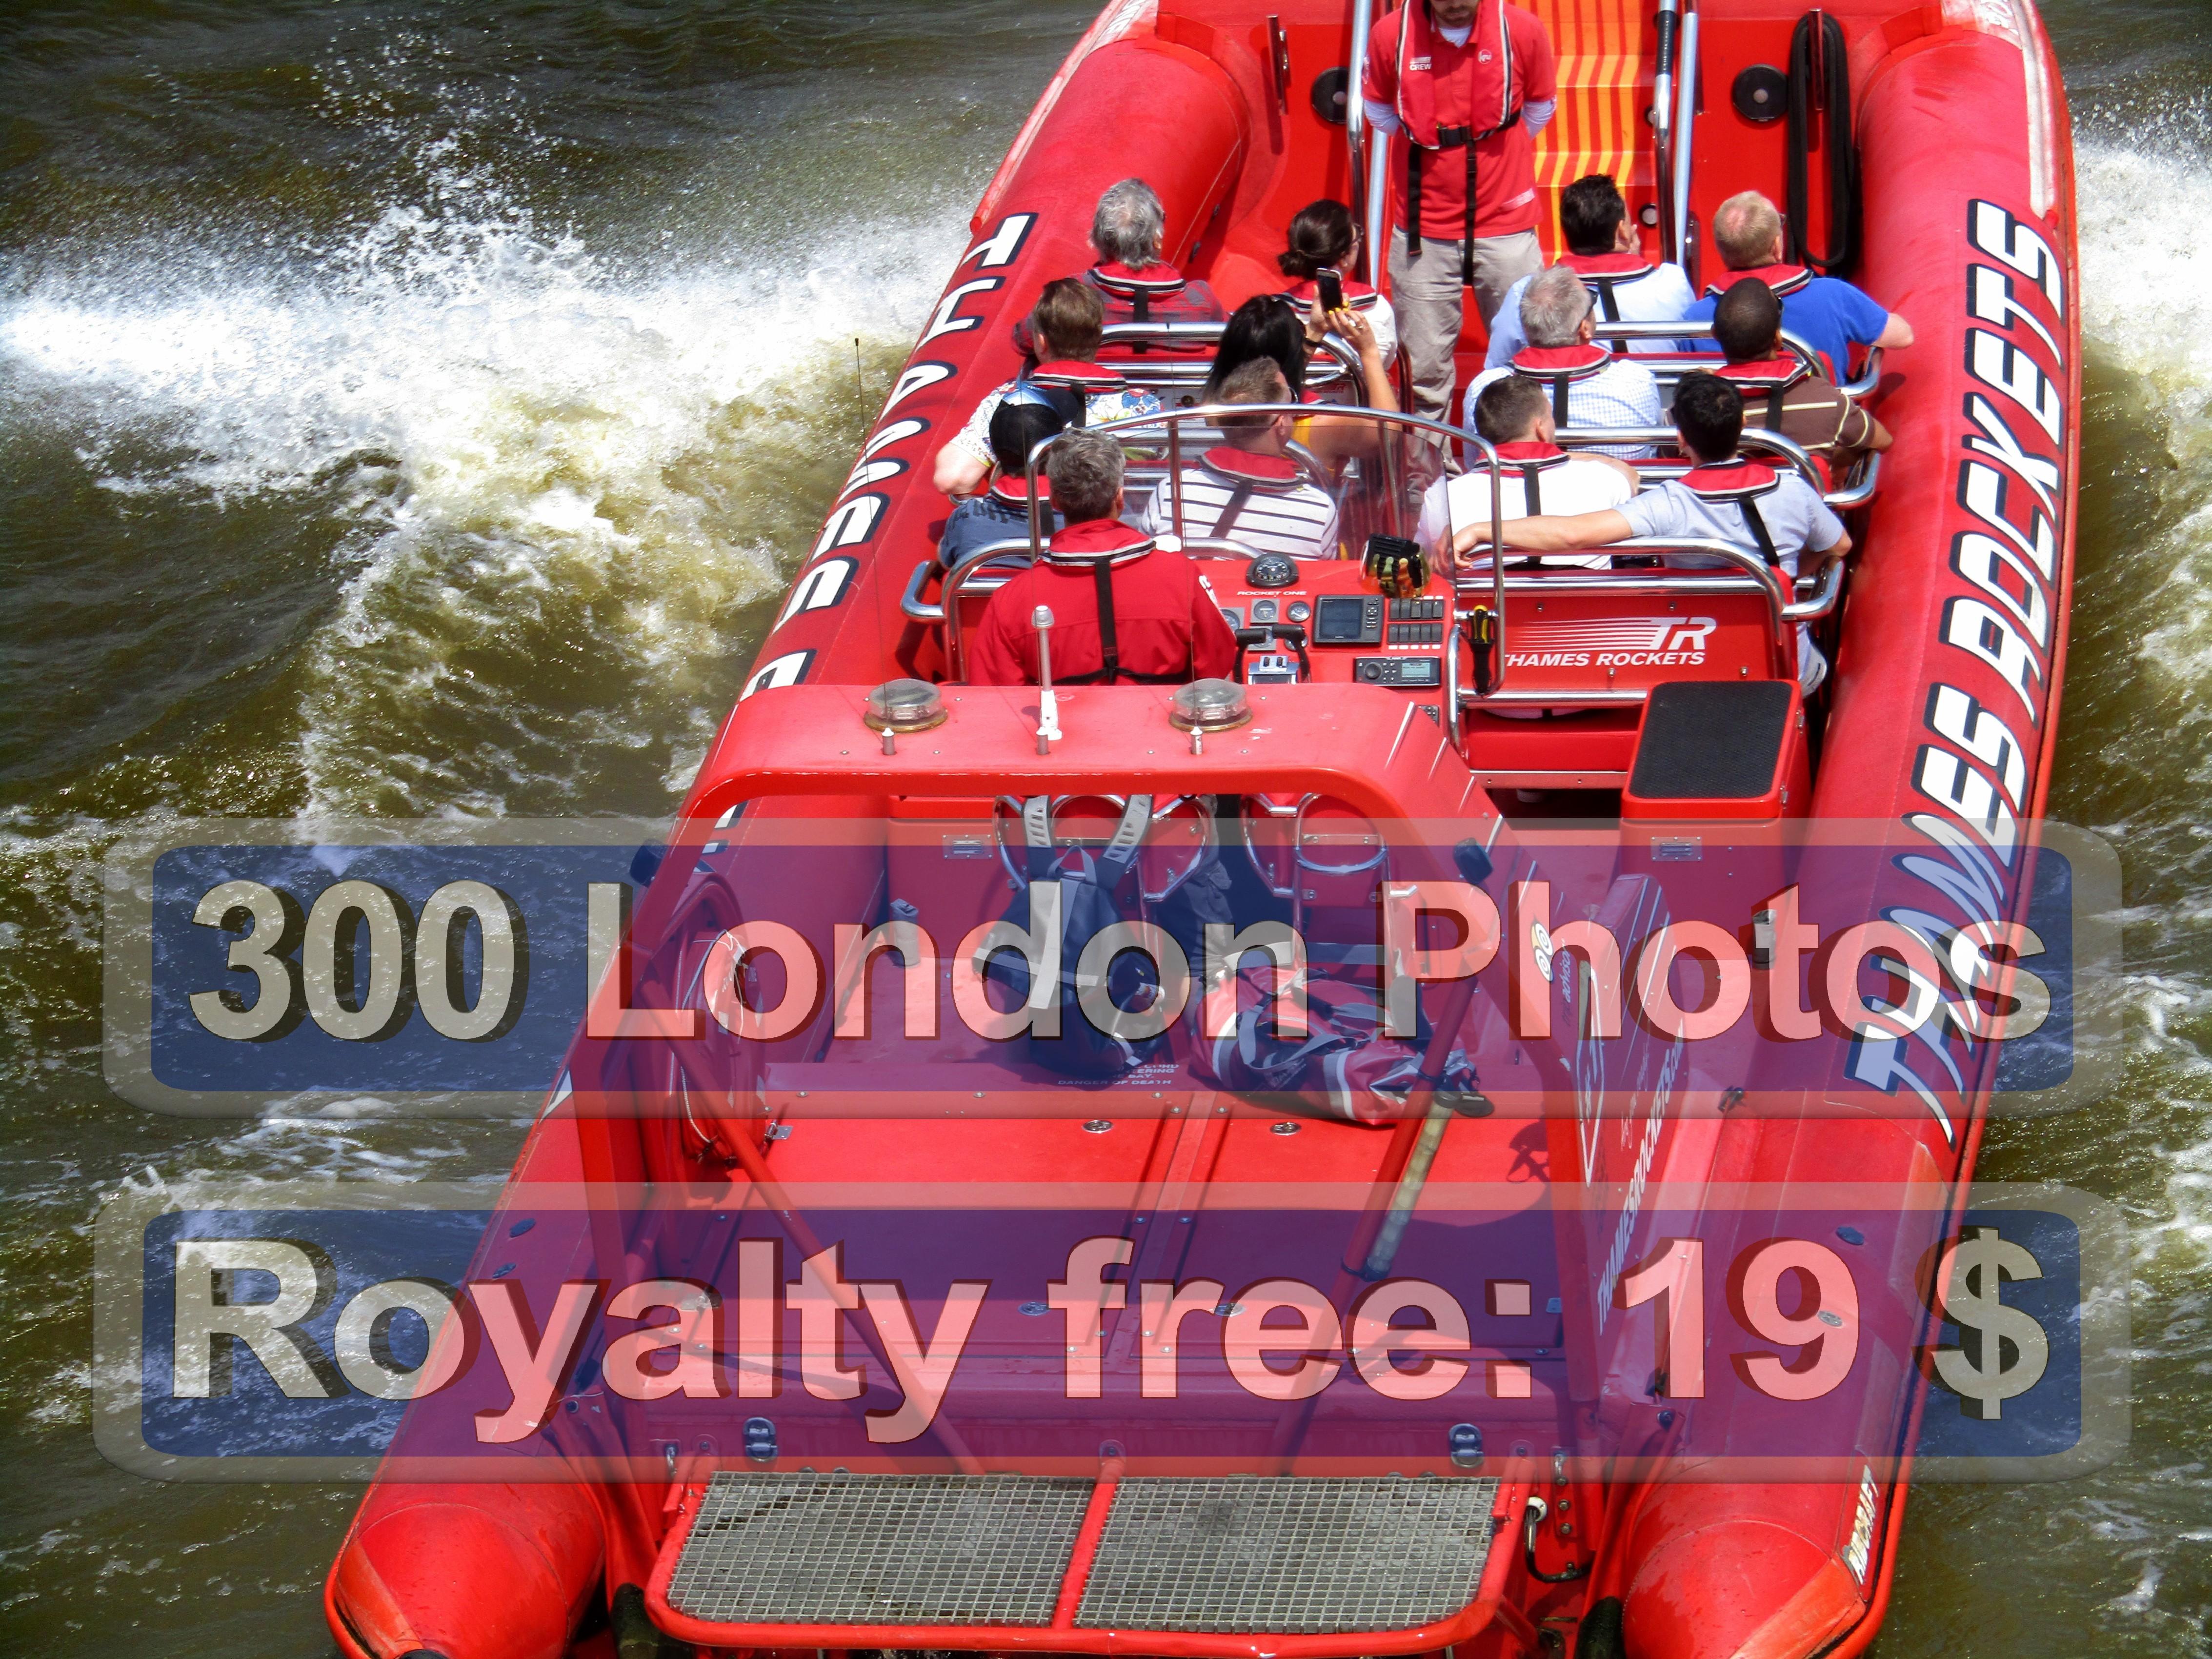 London Photo Festival 2016